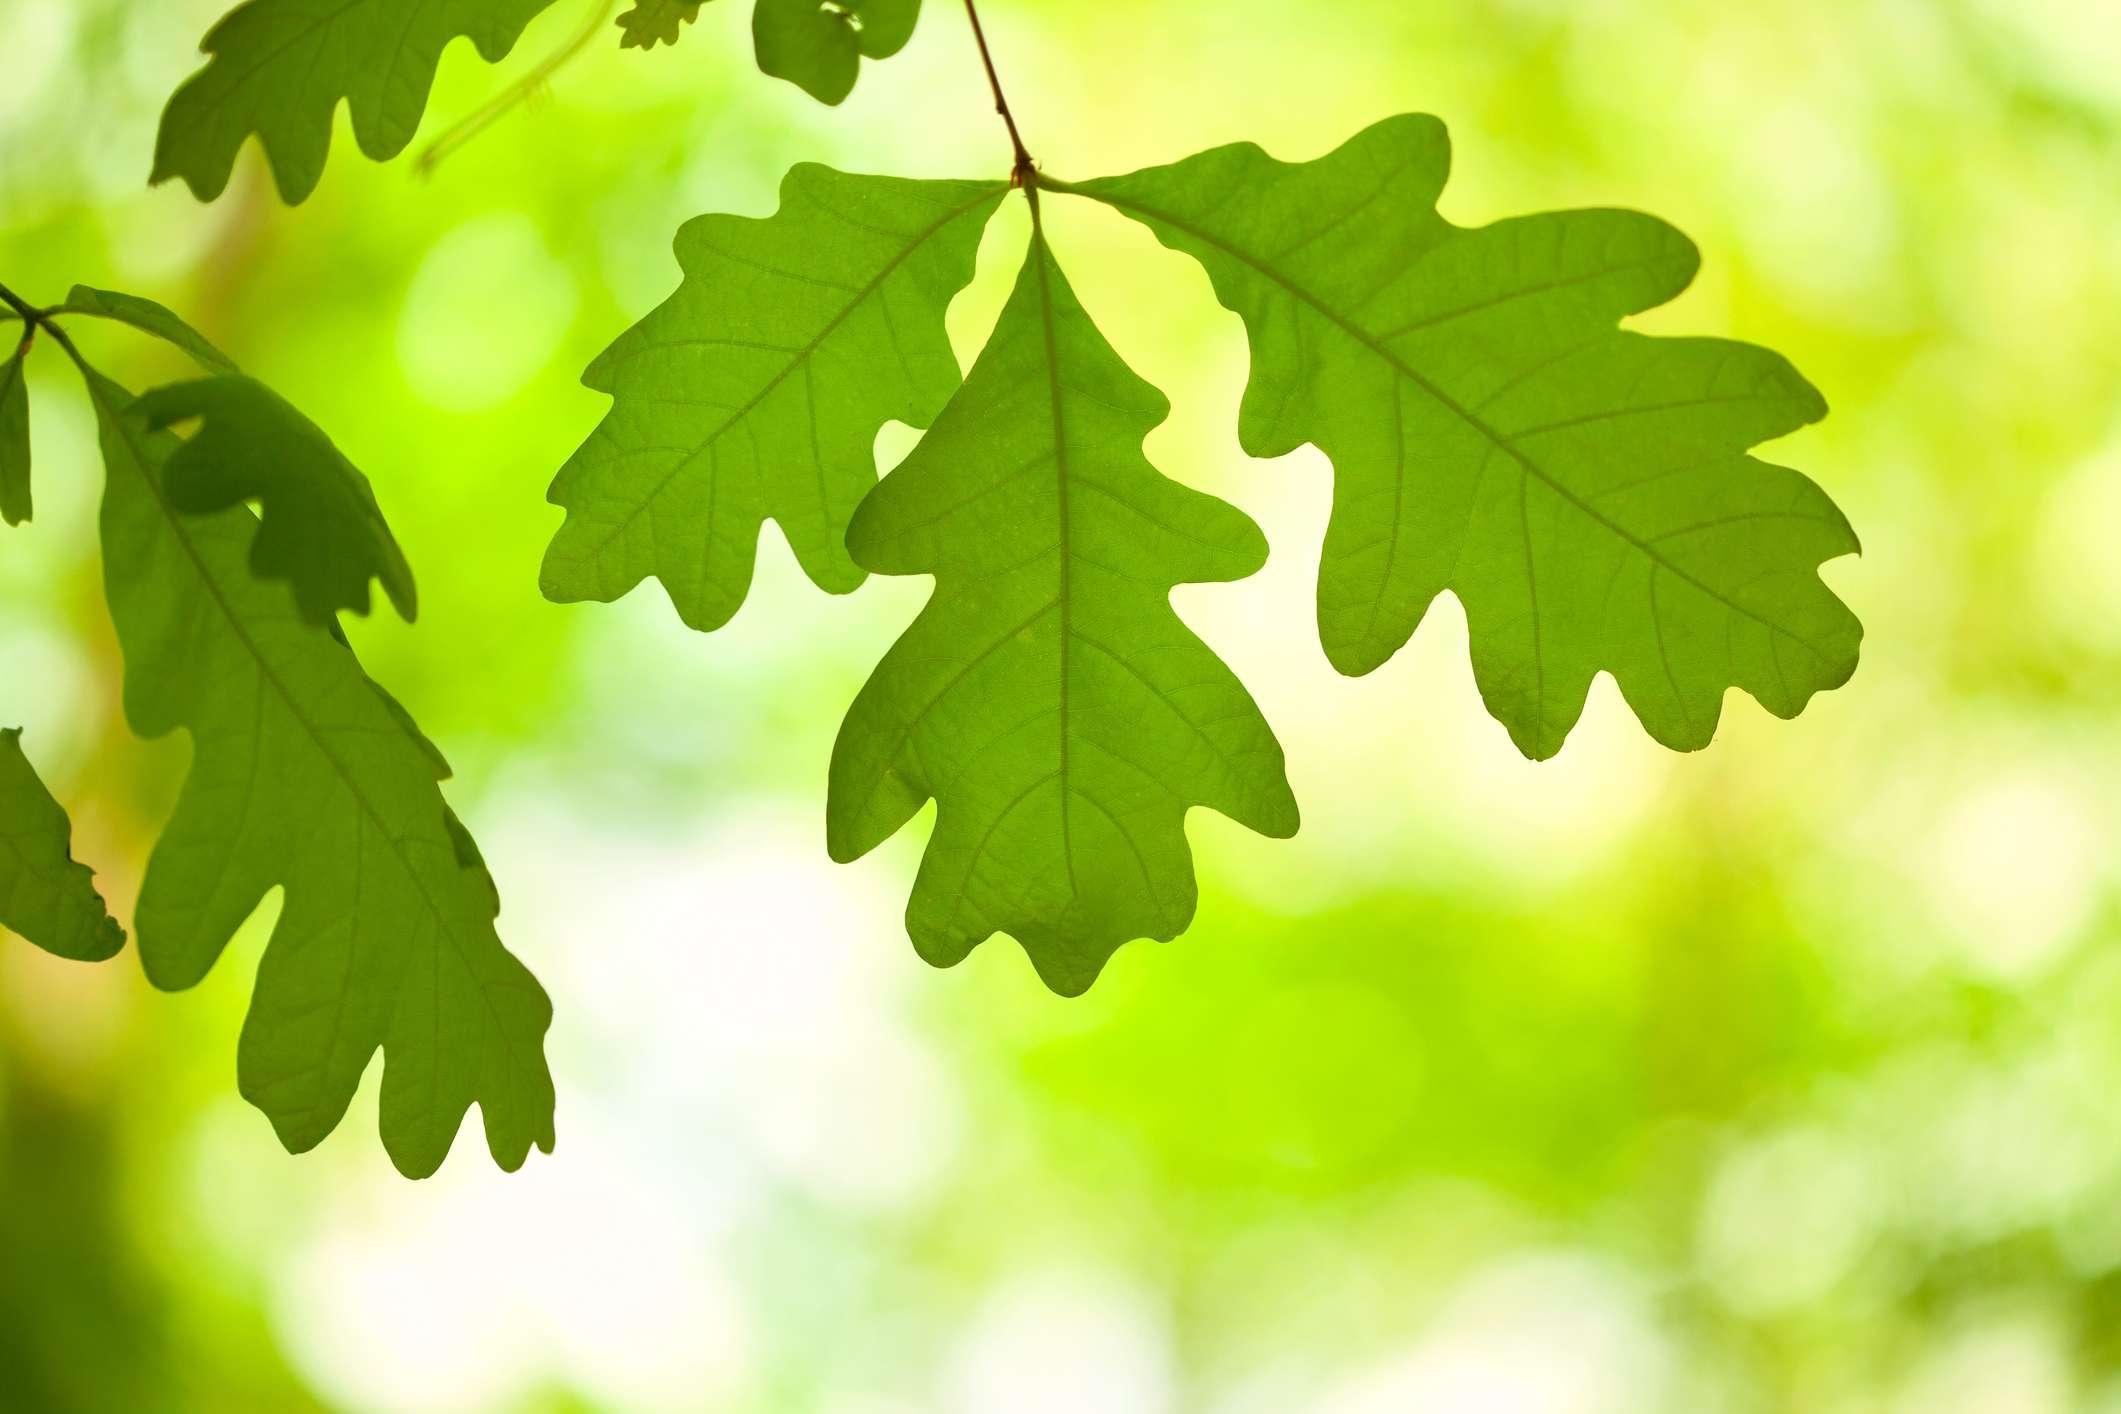 Green oak leaves hanging on a tree branch.